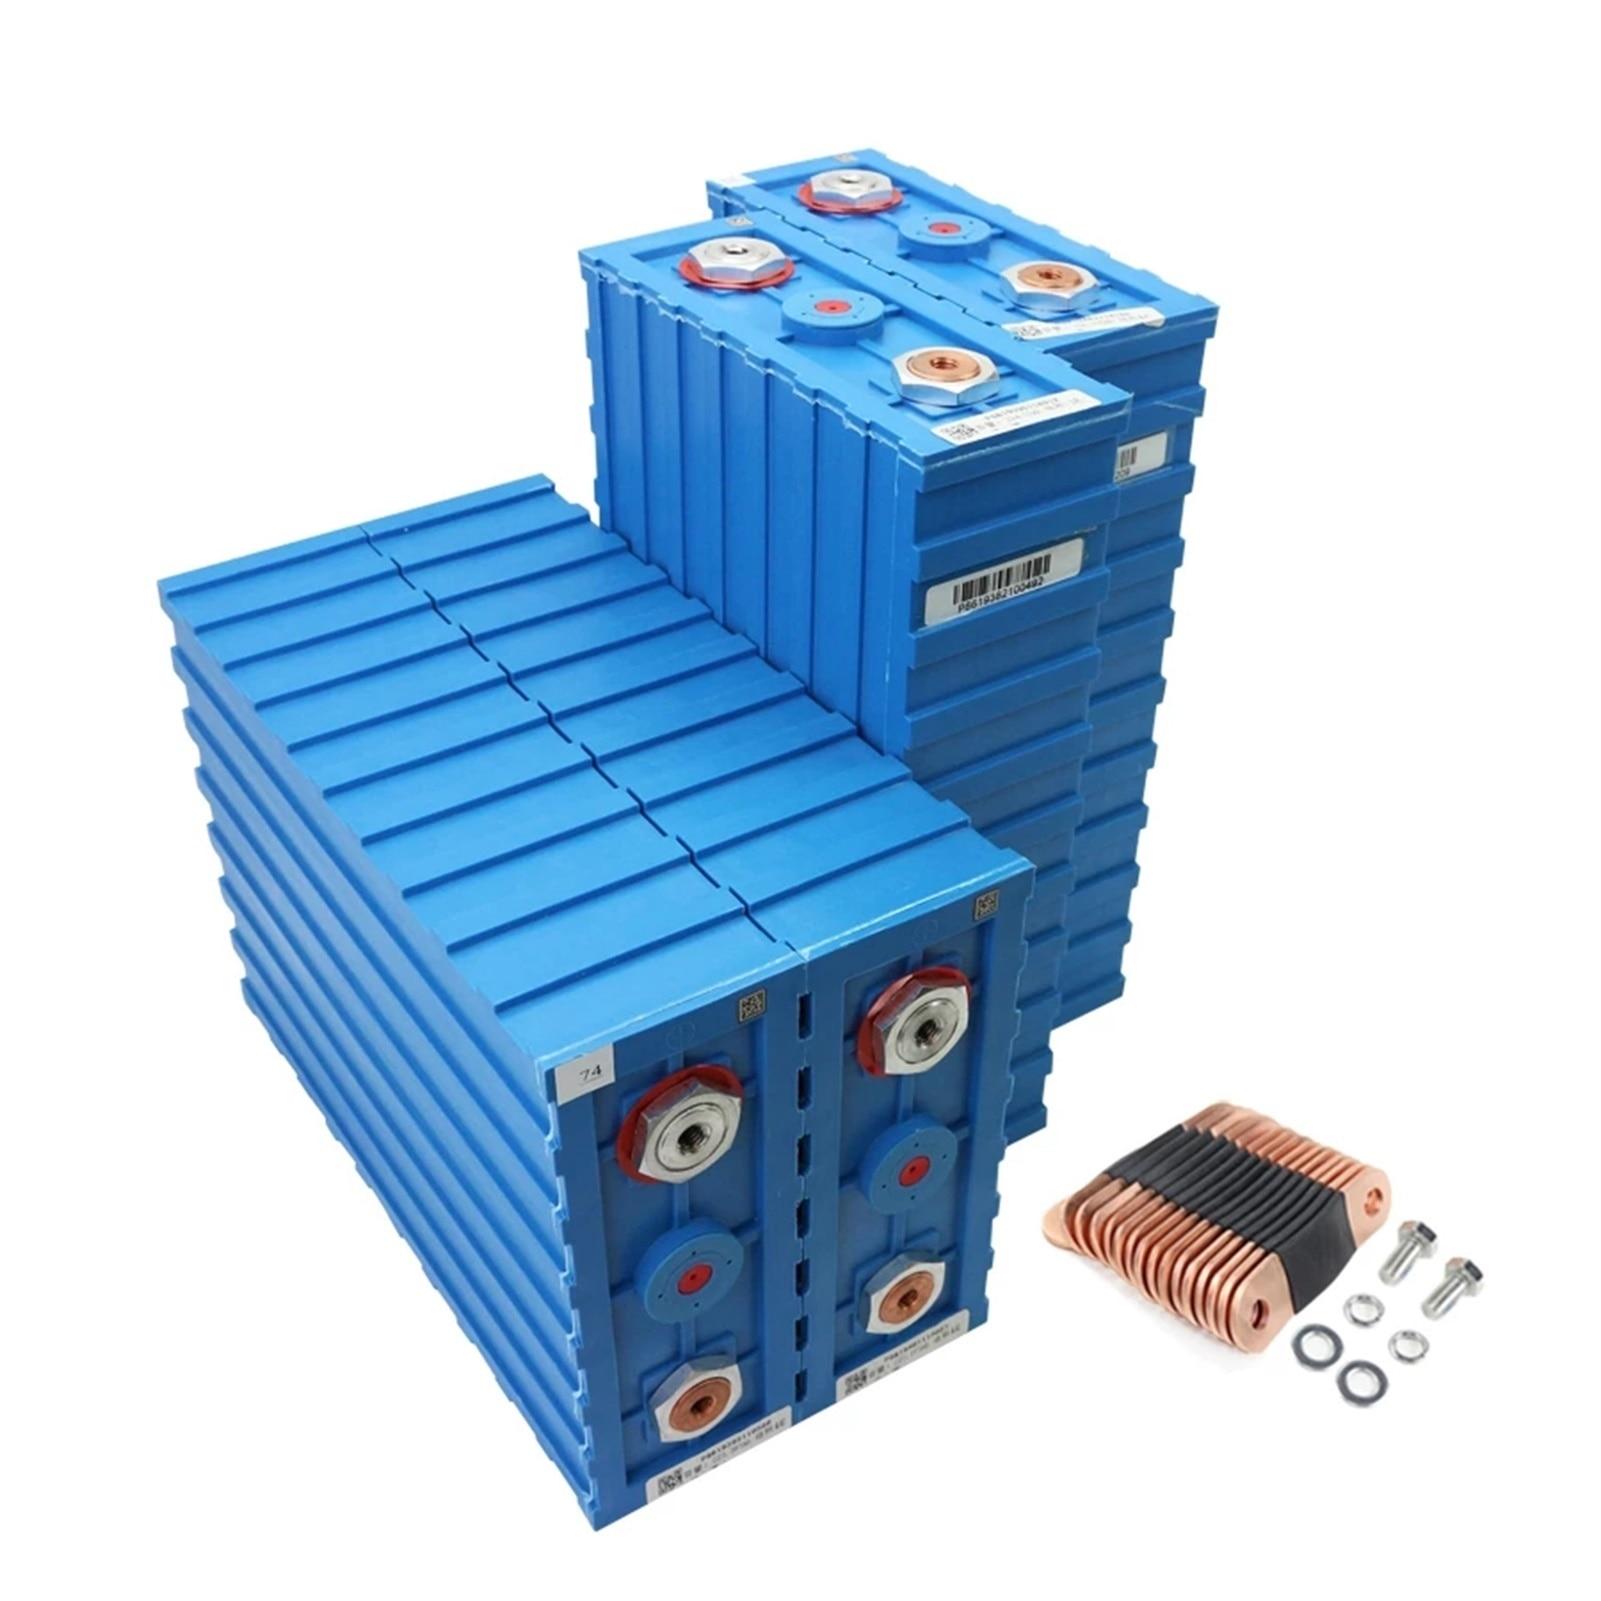 Lifepo4 200Ah 4 قطعة بطارية قابلة لإعادة التدوير 3.2 فولت الصف أ ليثيوم الحديد الفوسفات الخلايا الشمسية تخزين الطاقة الاتحاد الأوروبي الولايات المت...